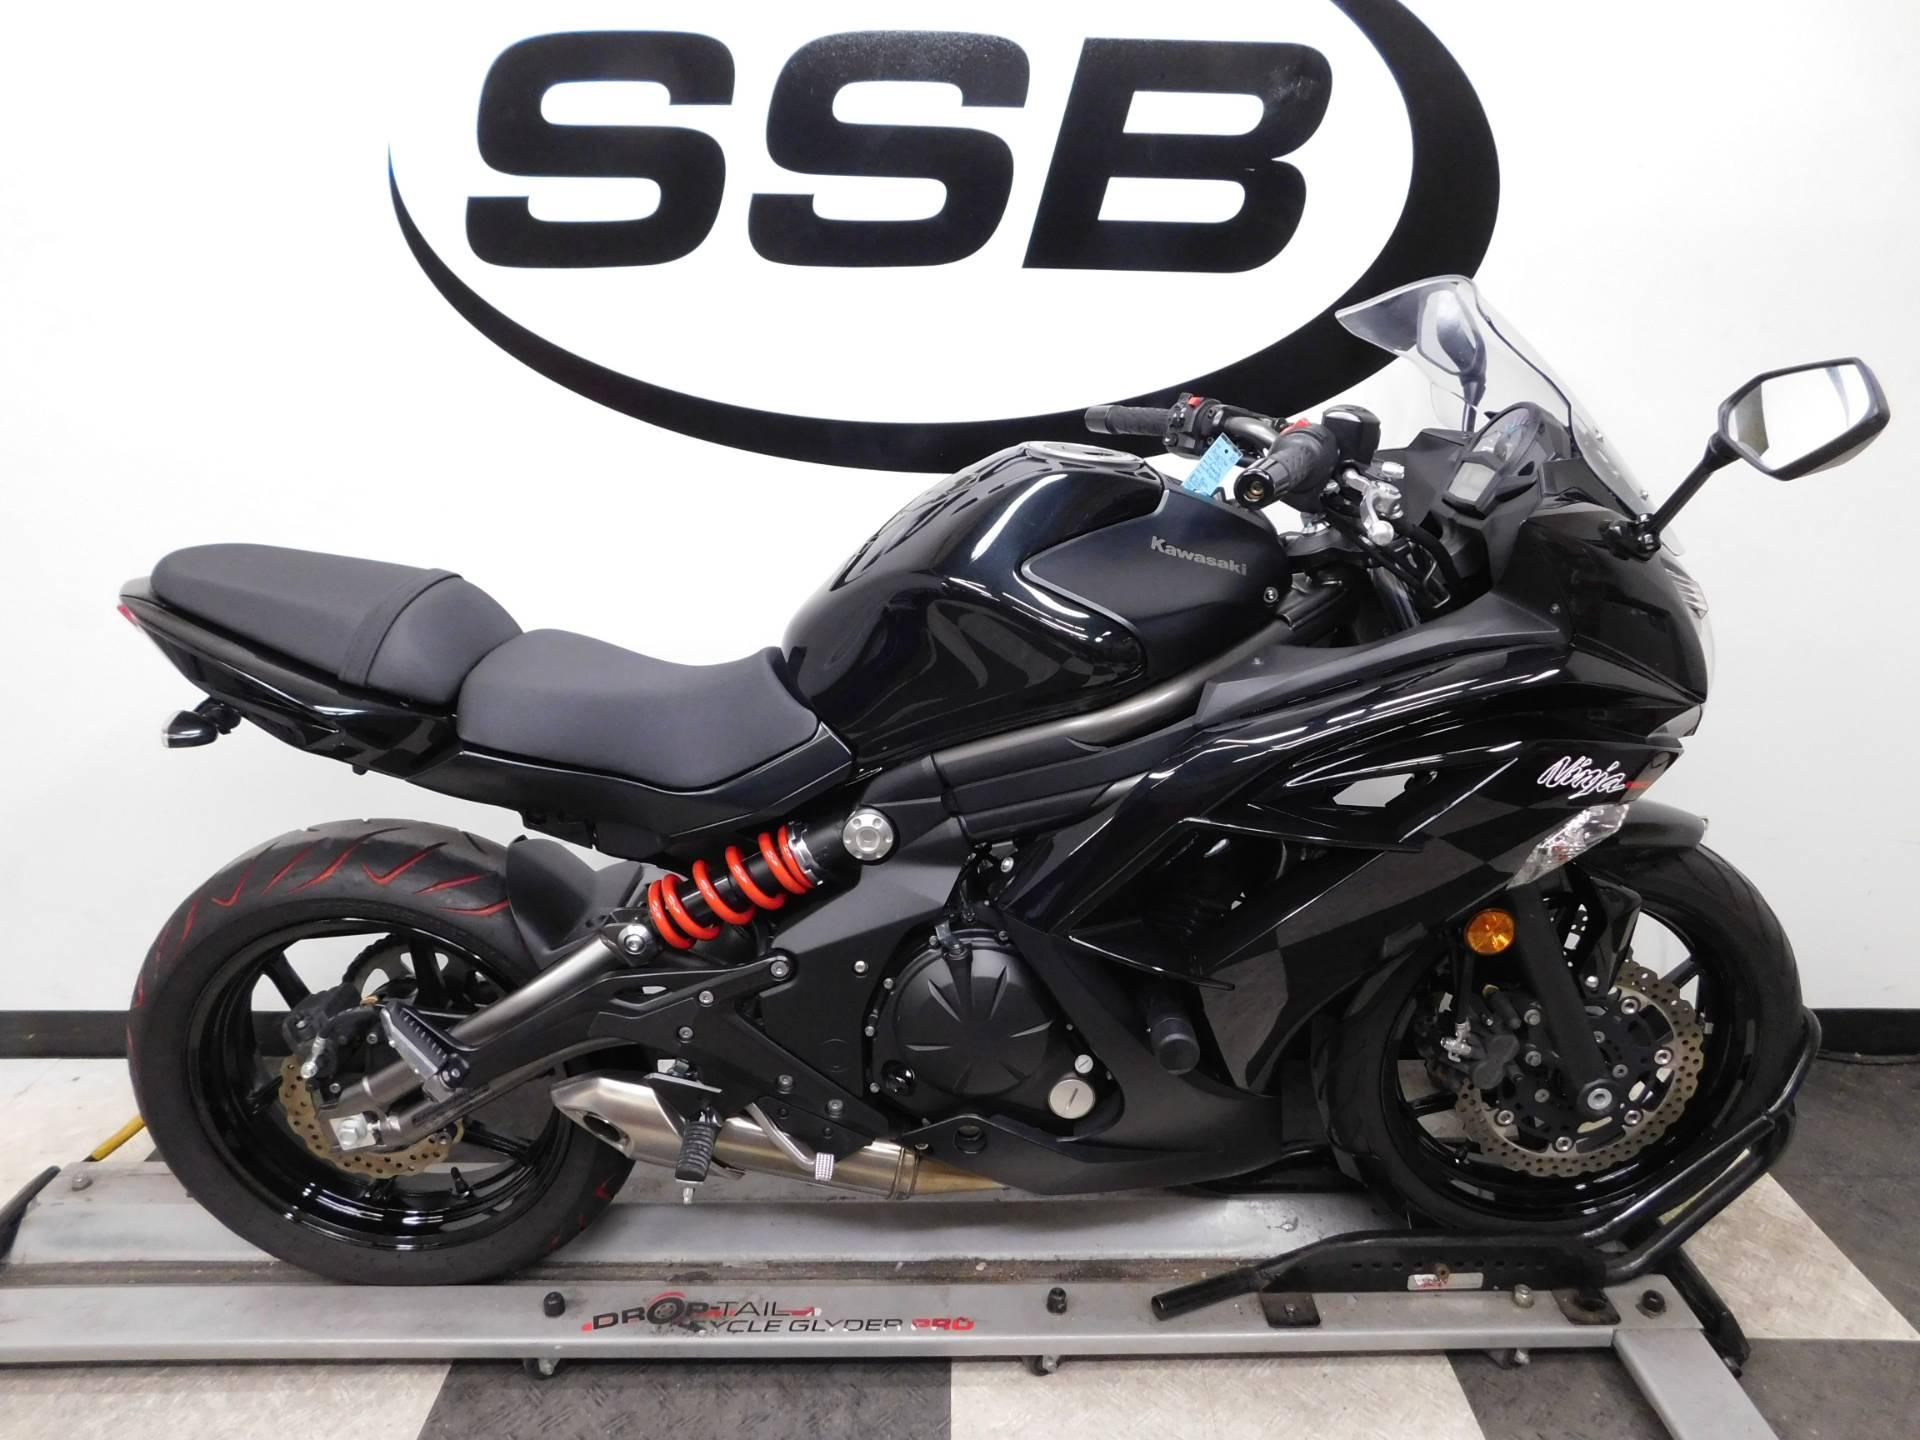 2012 Kawasaki Ninja 650 1